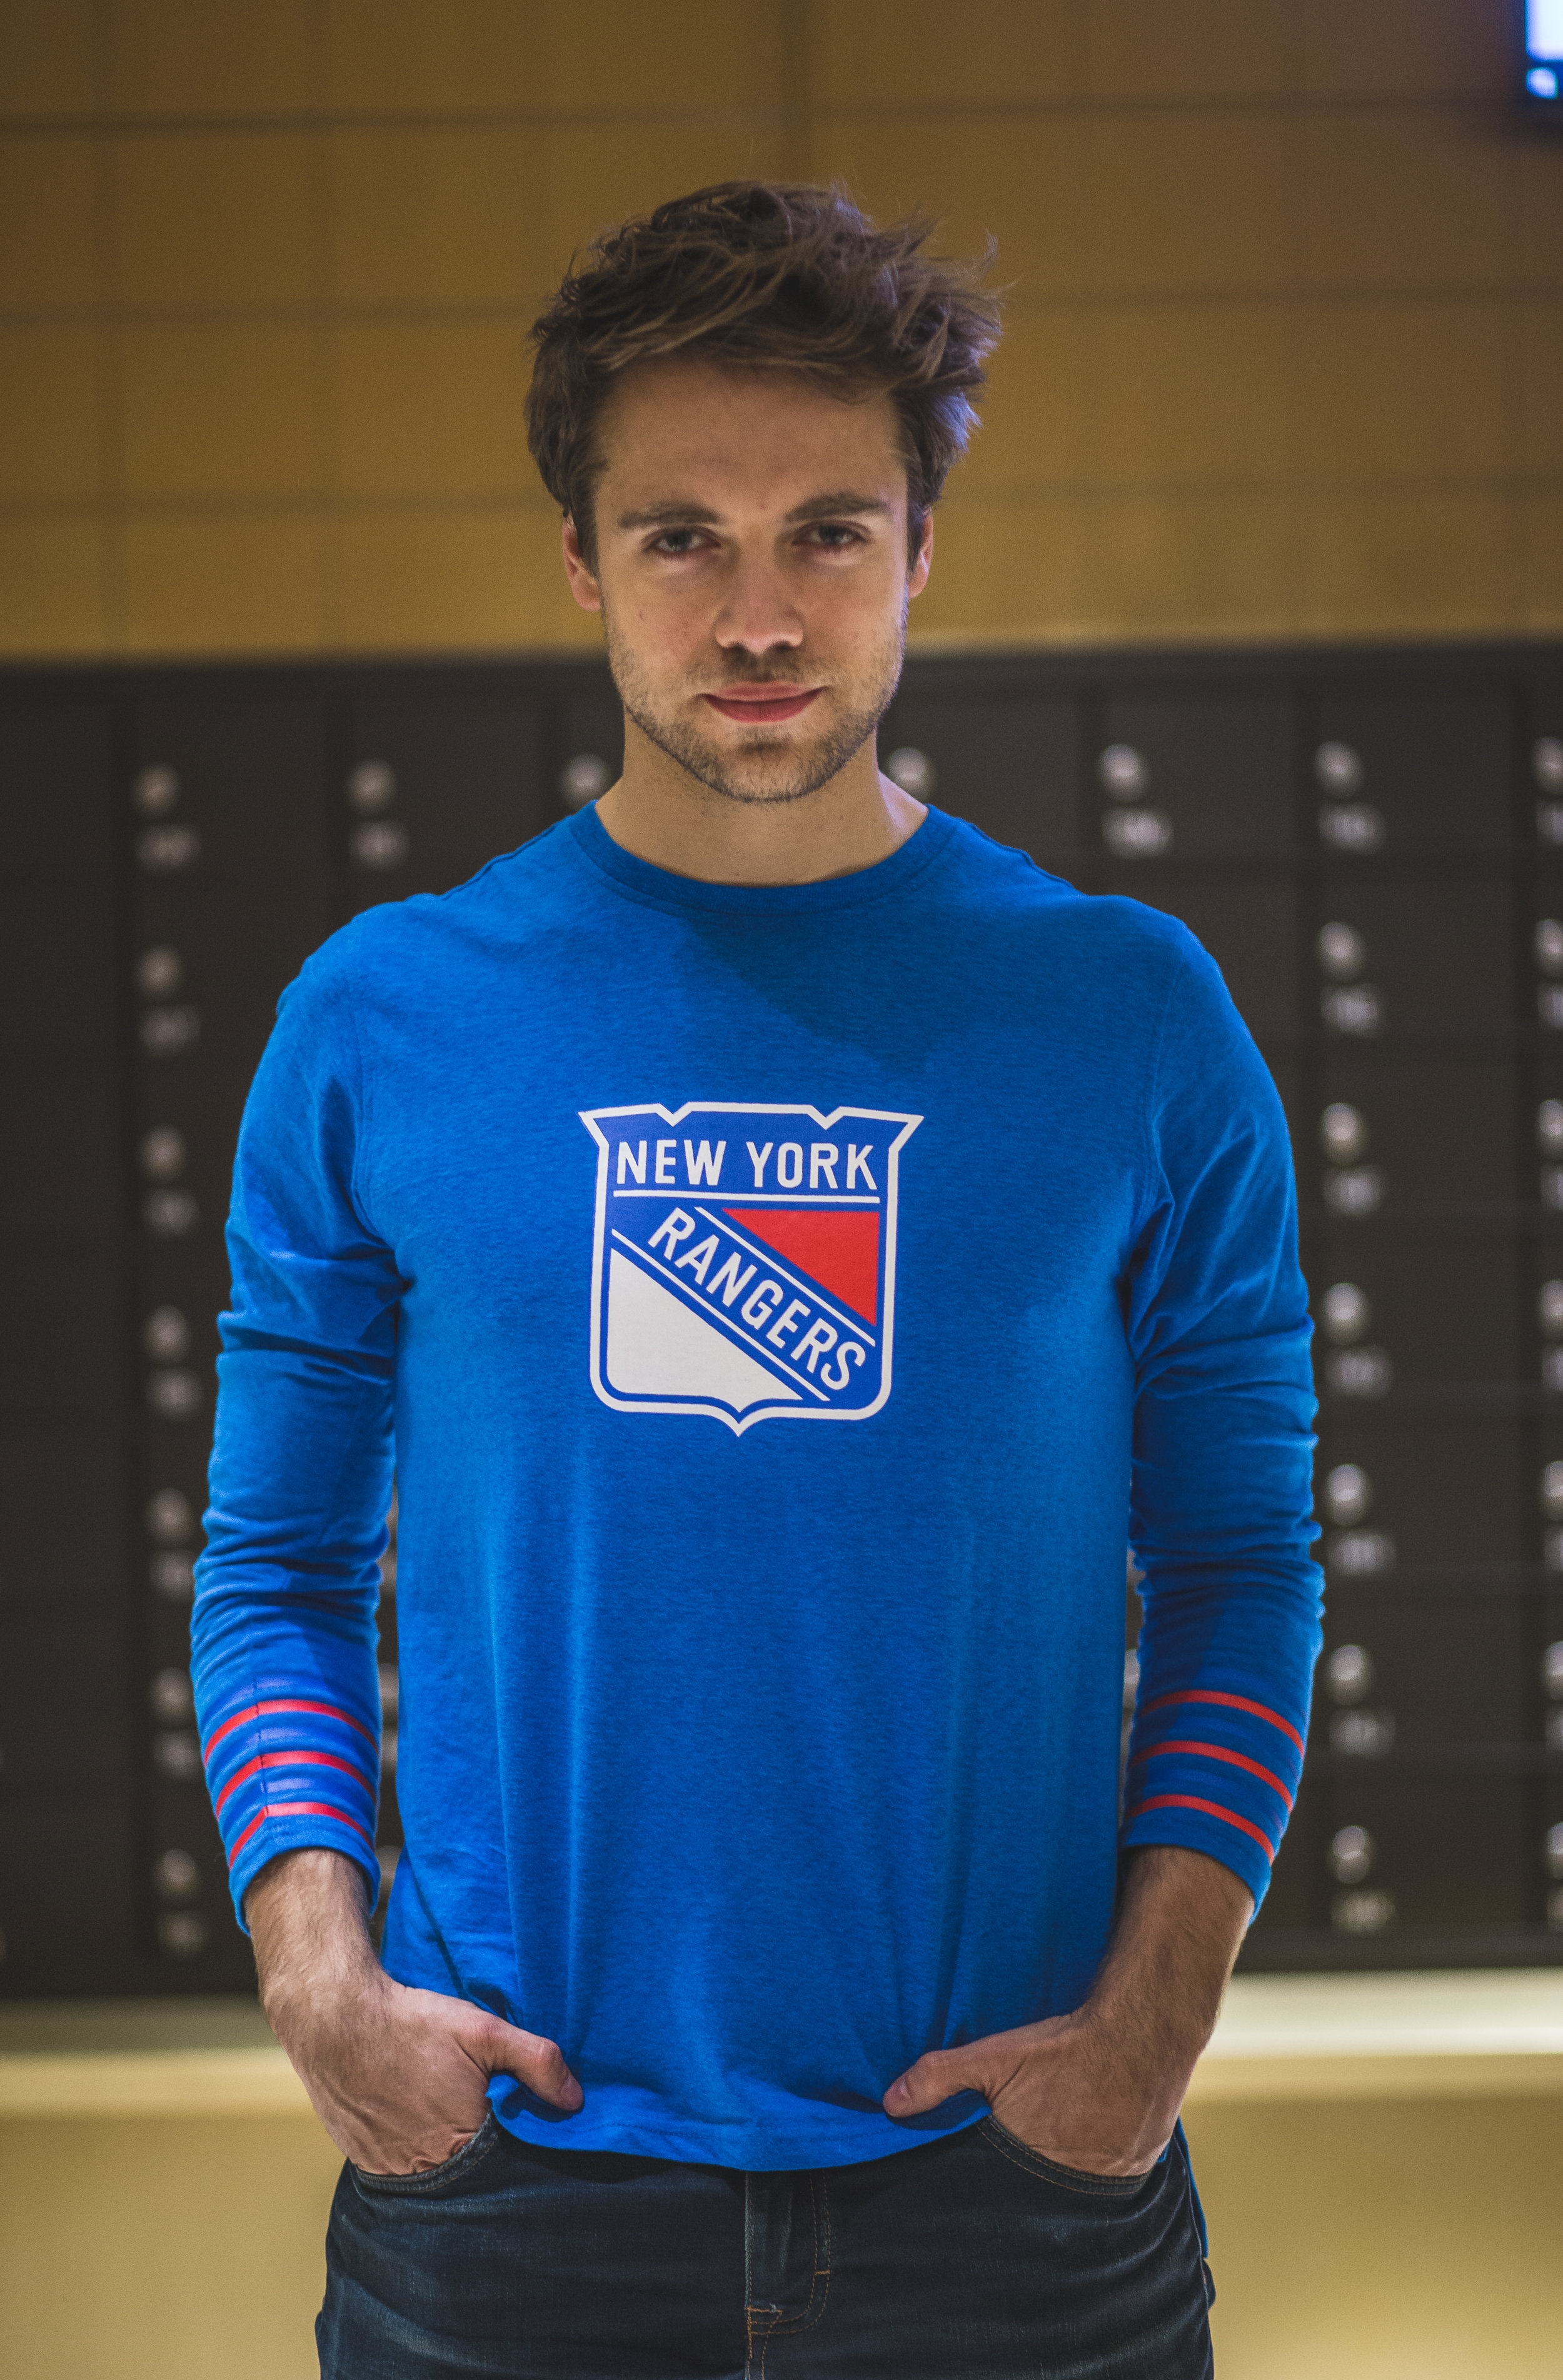 Grungy Gentleman x New York Rangers 9.jpg